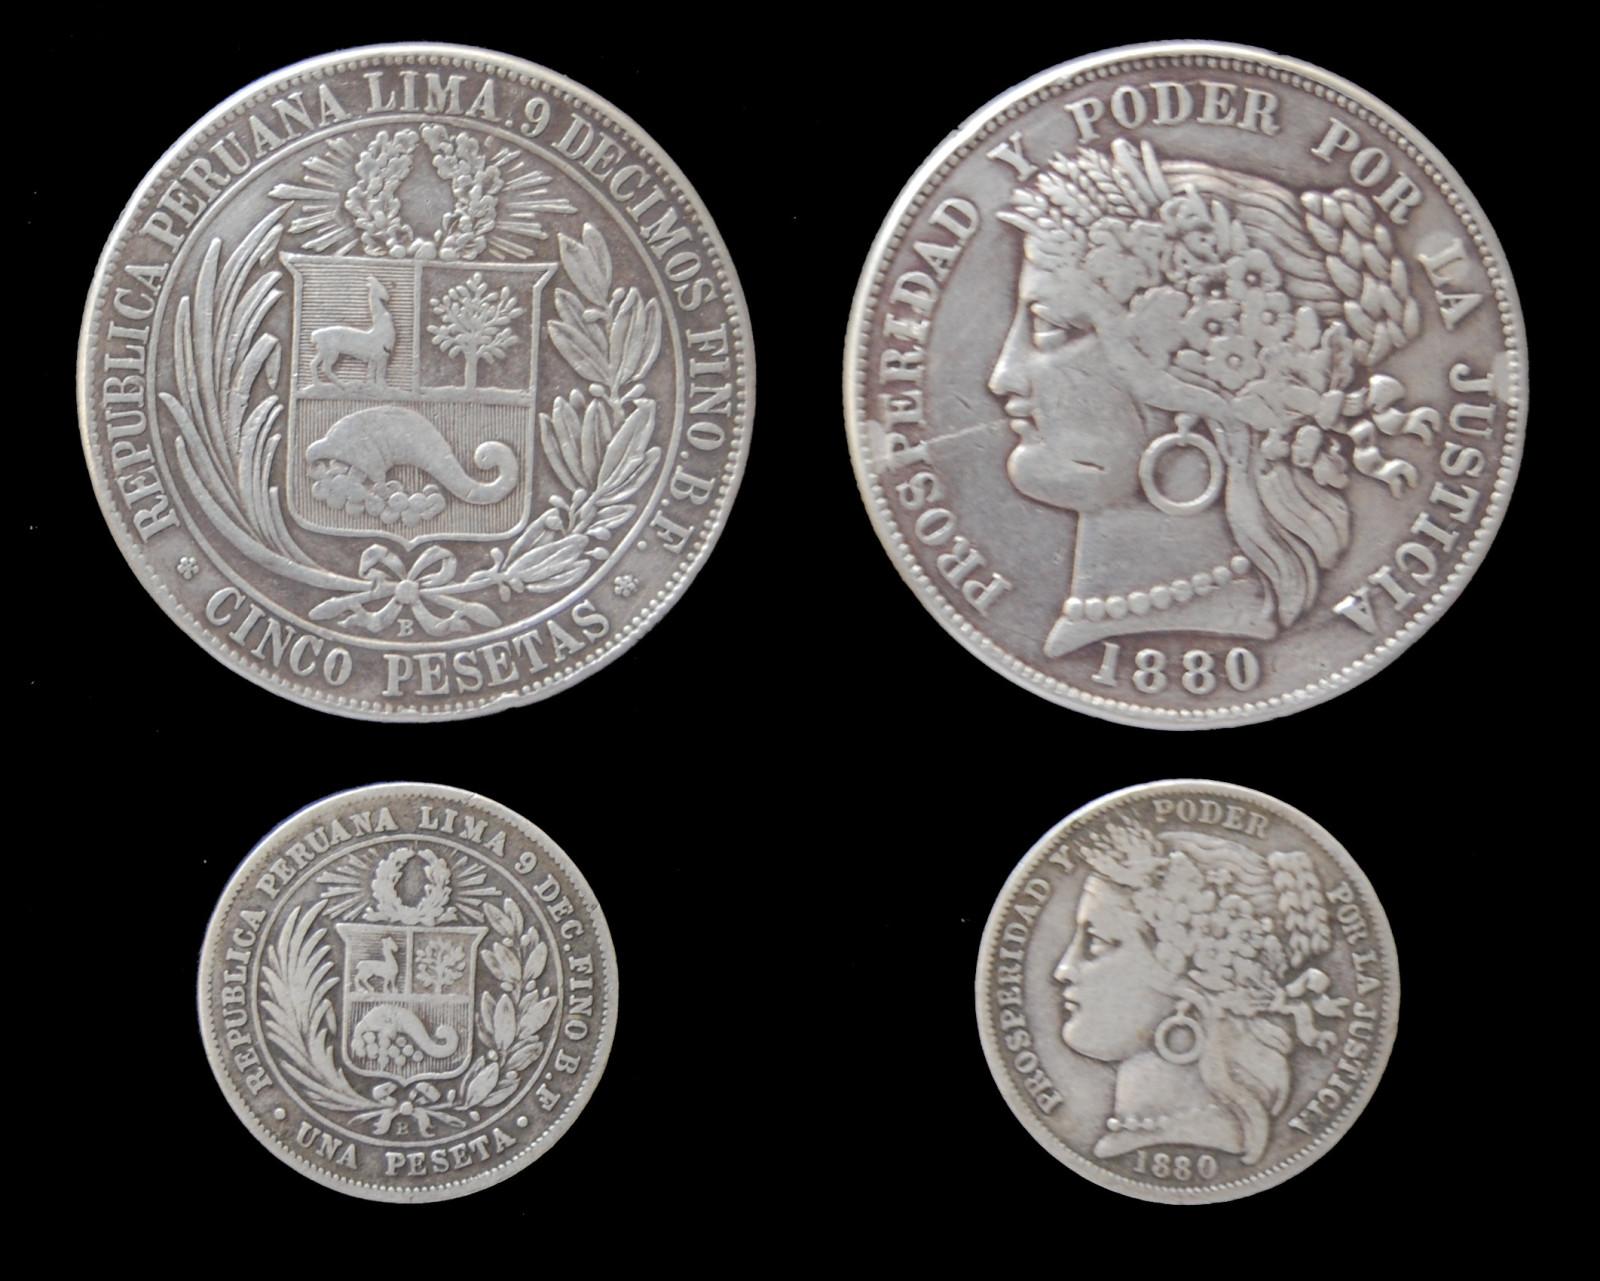 pesetas - Peru 5 Pesetas 1880 16a6xwy